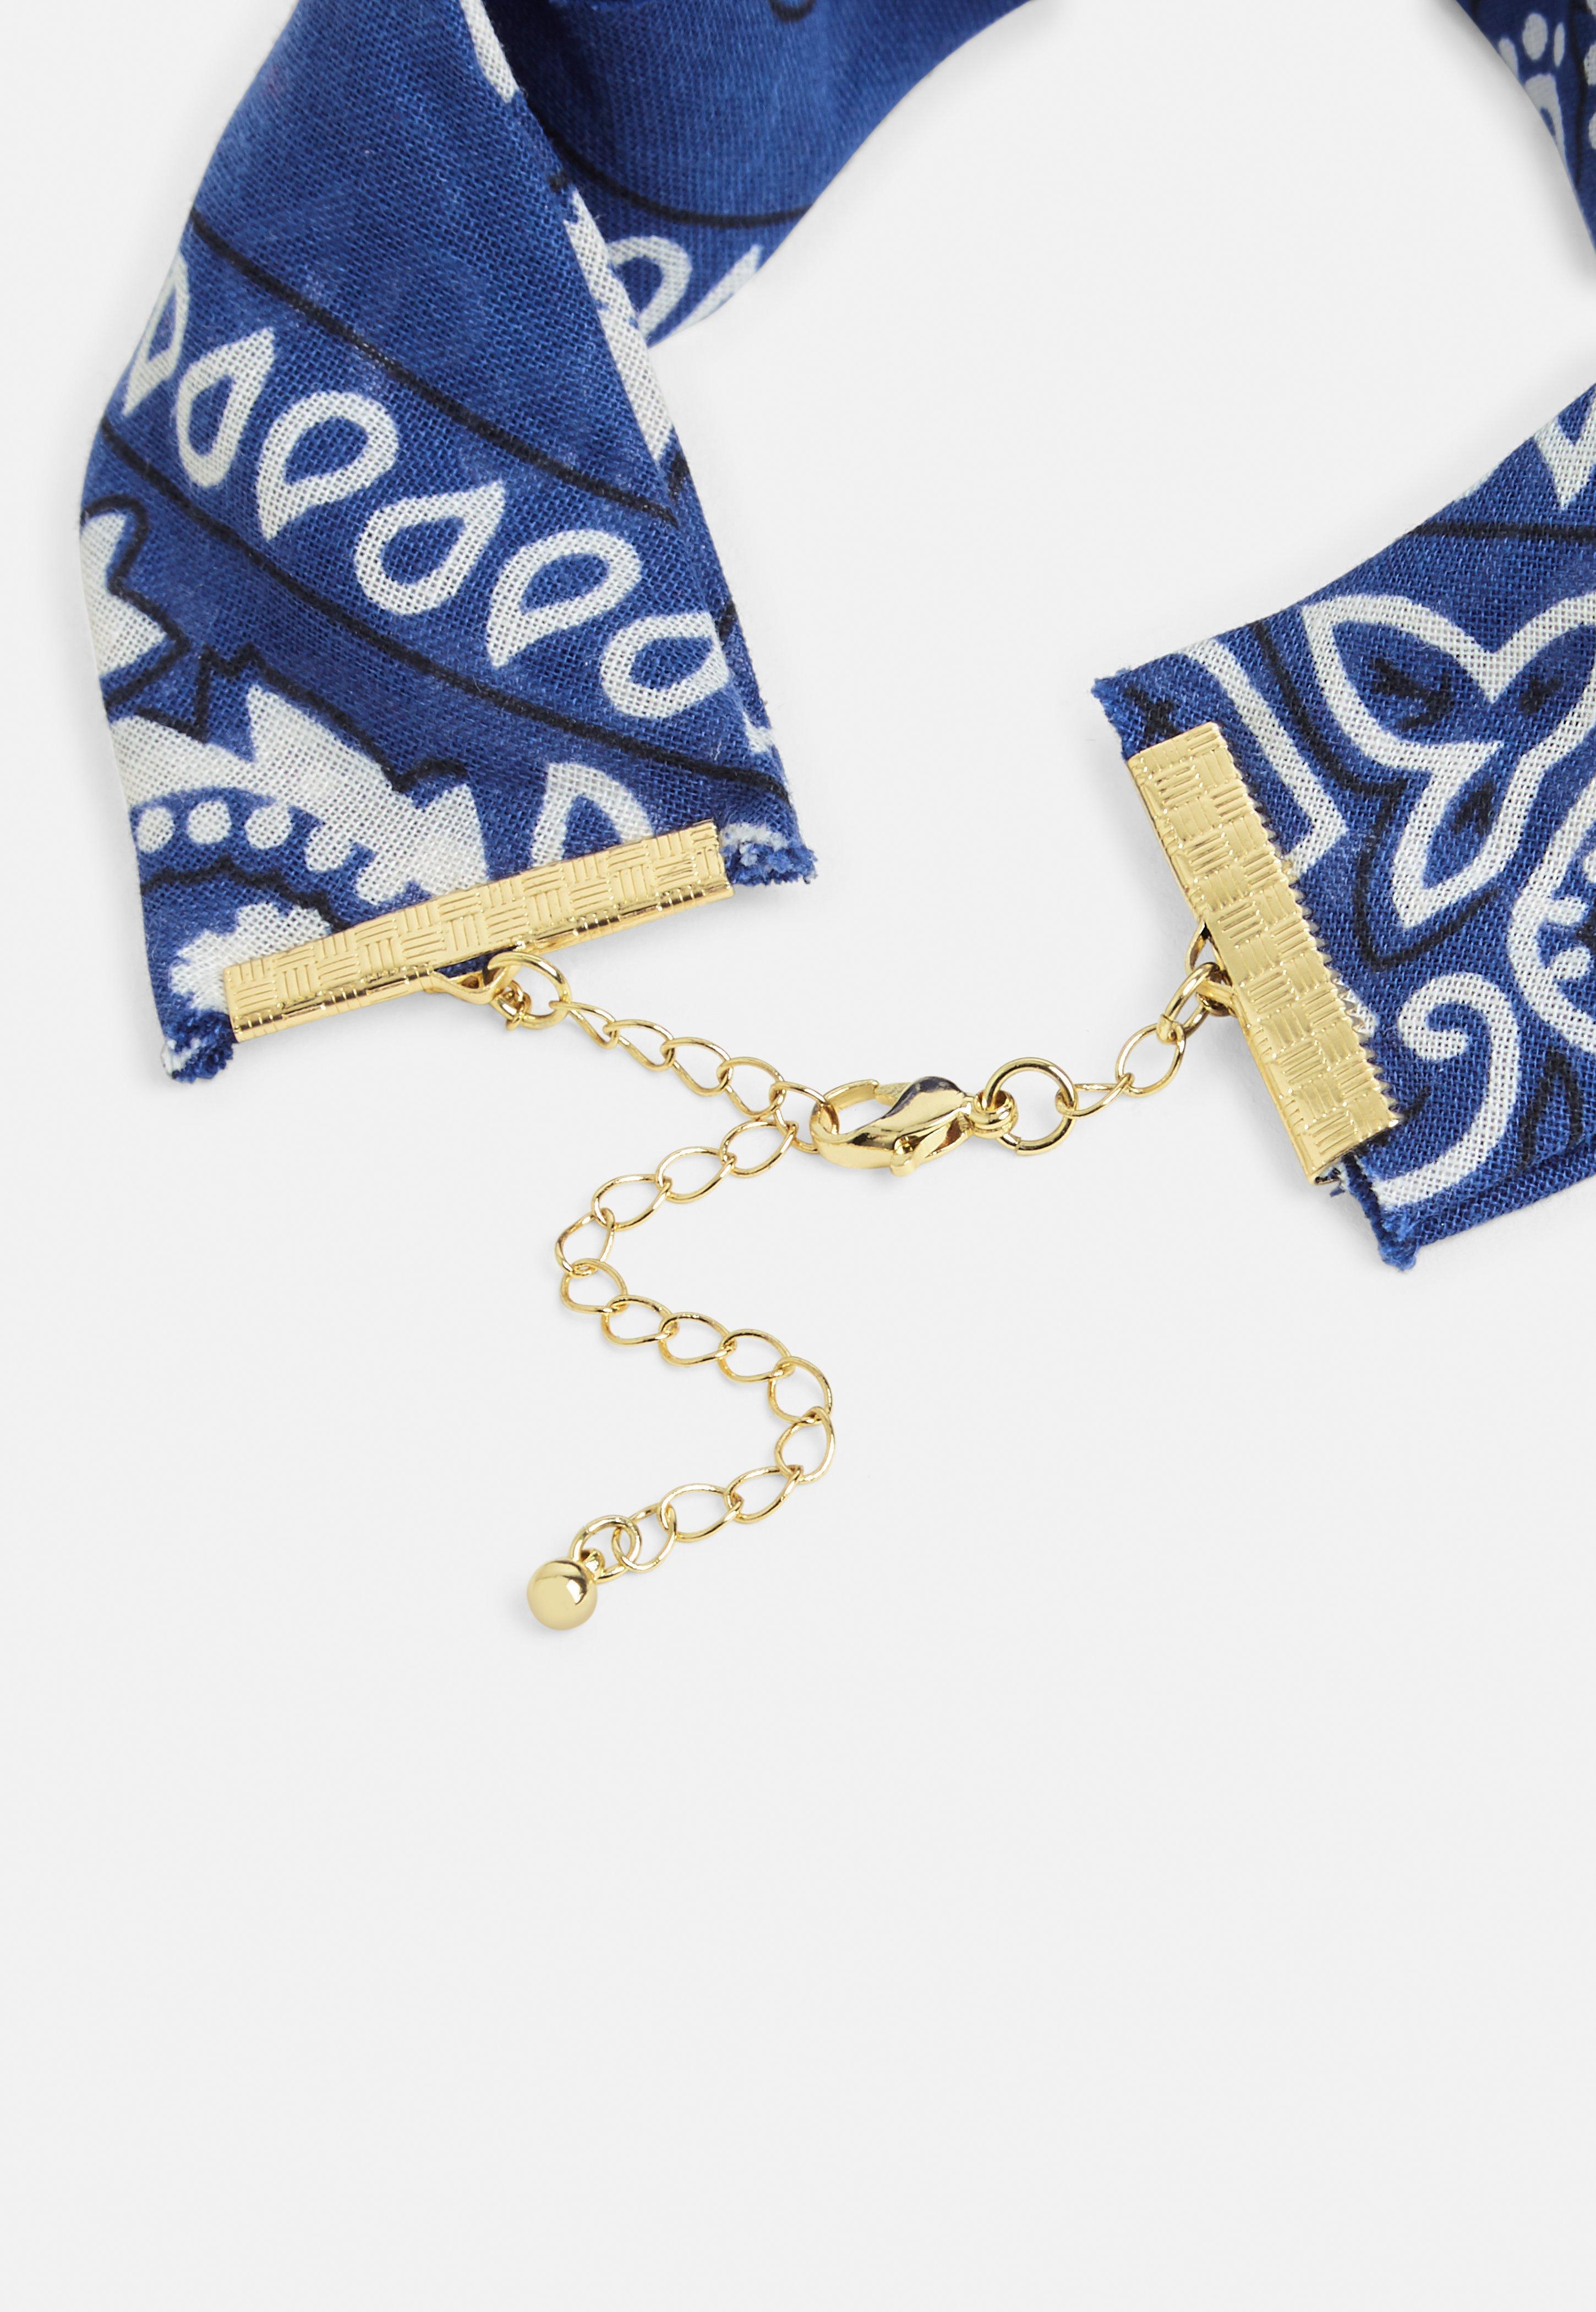 Missguided Blue Bandana Gold Choker Necklace